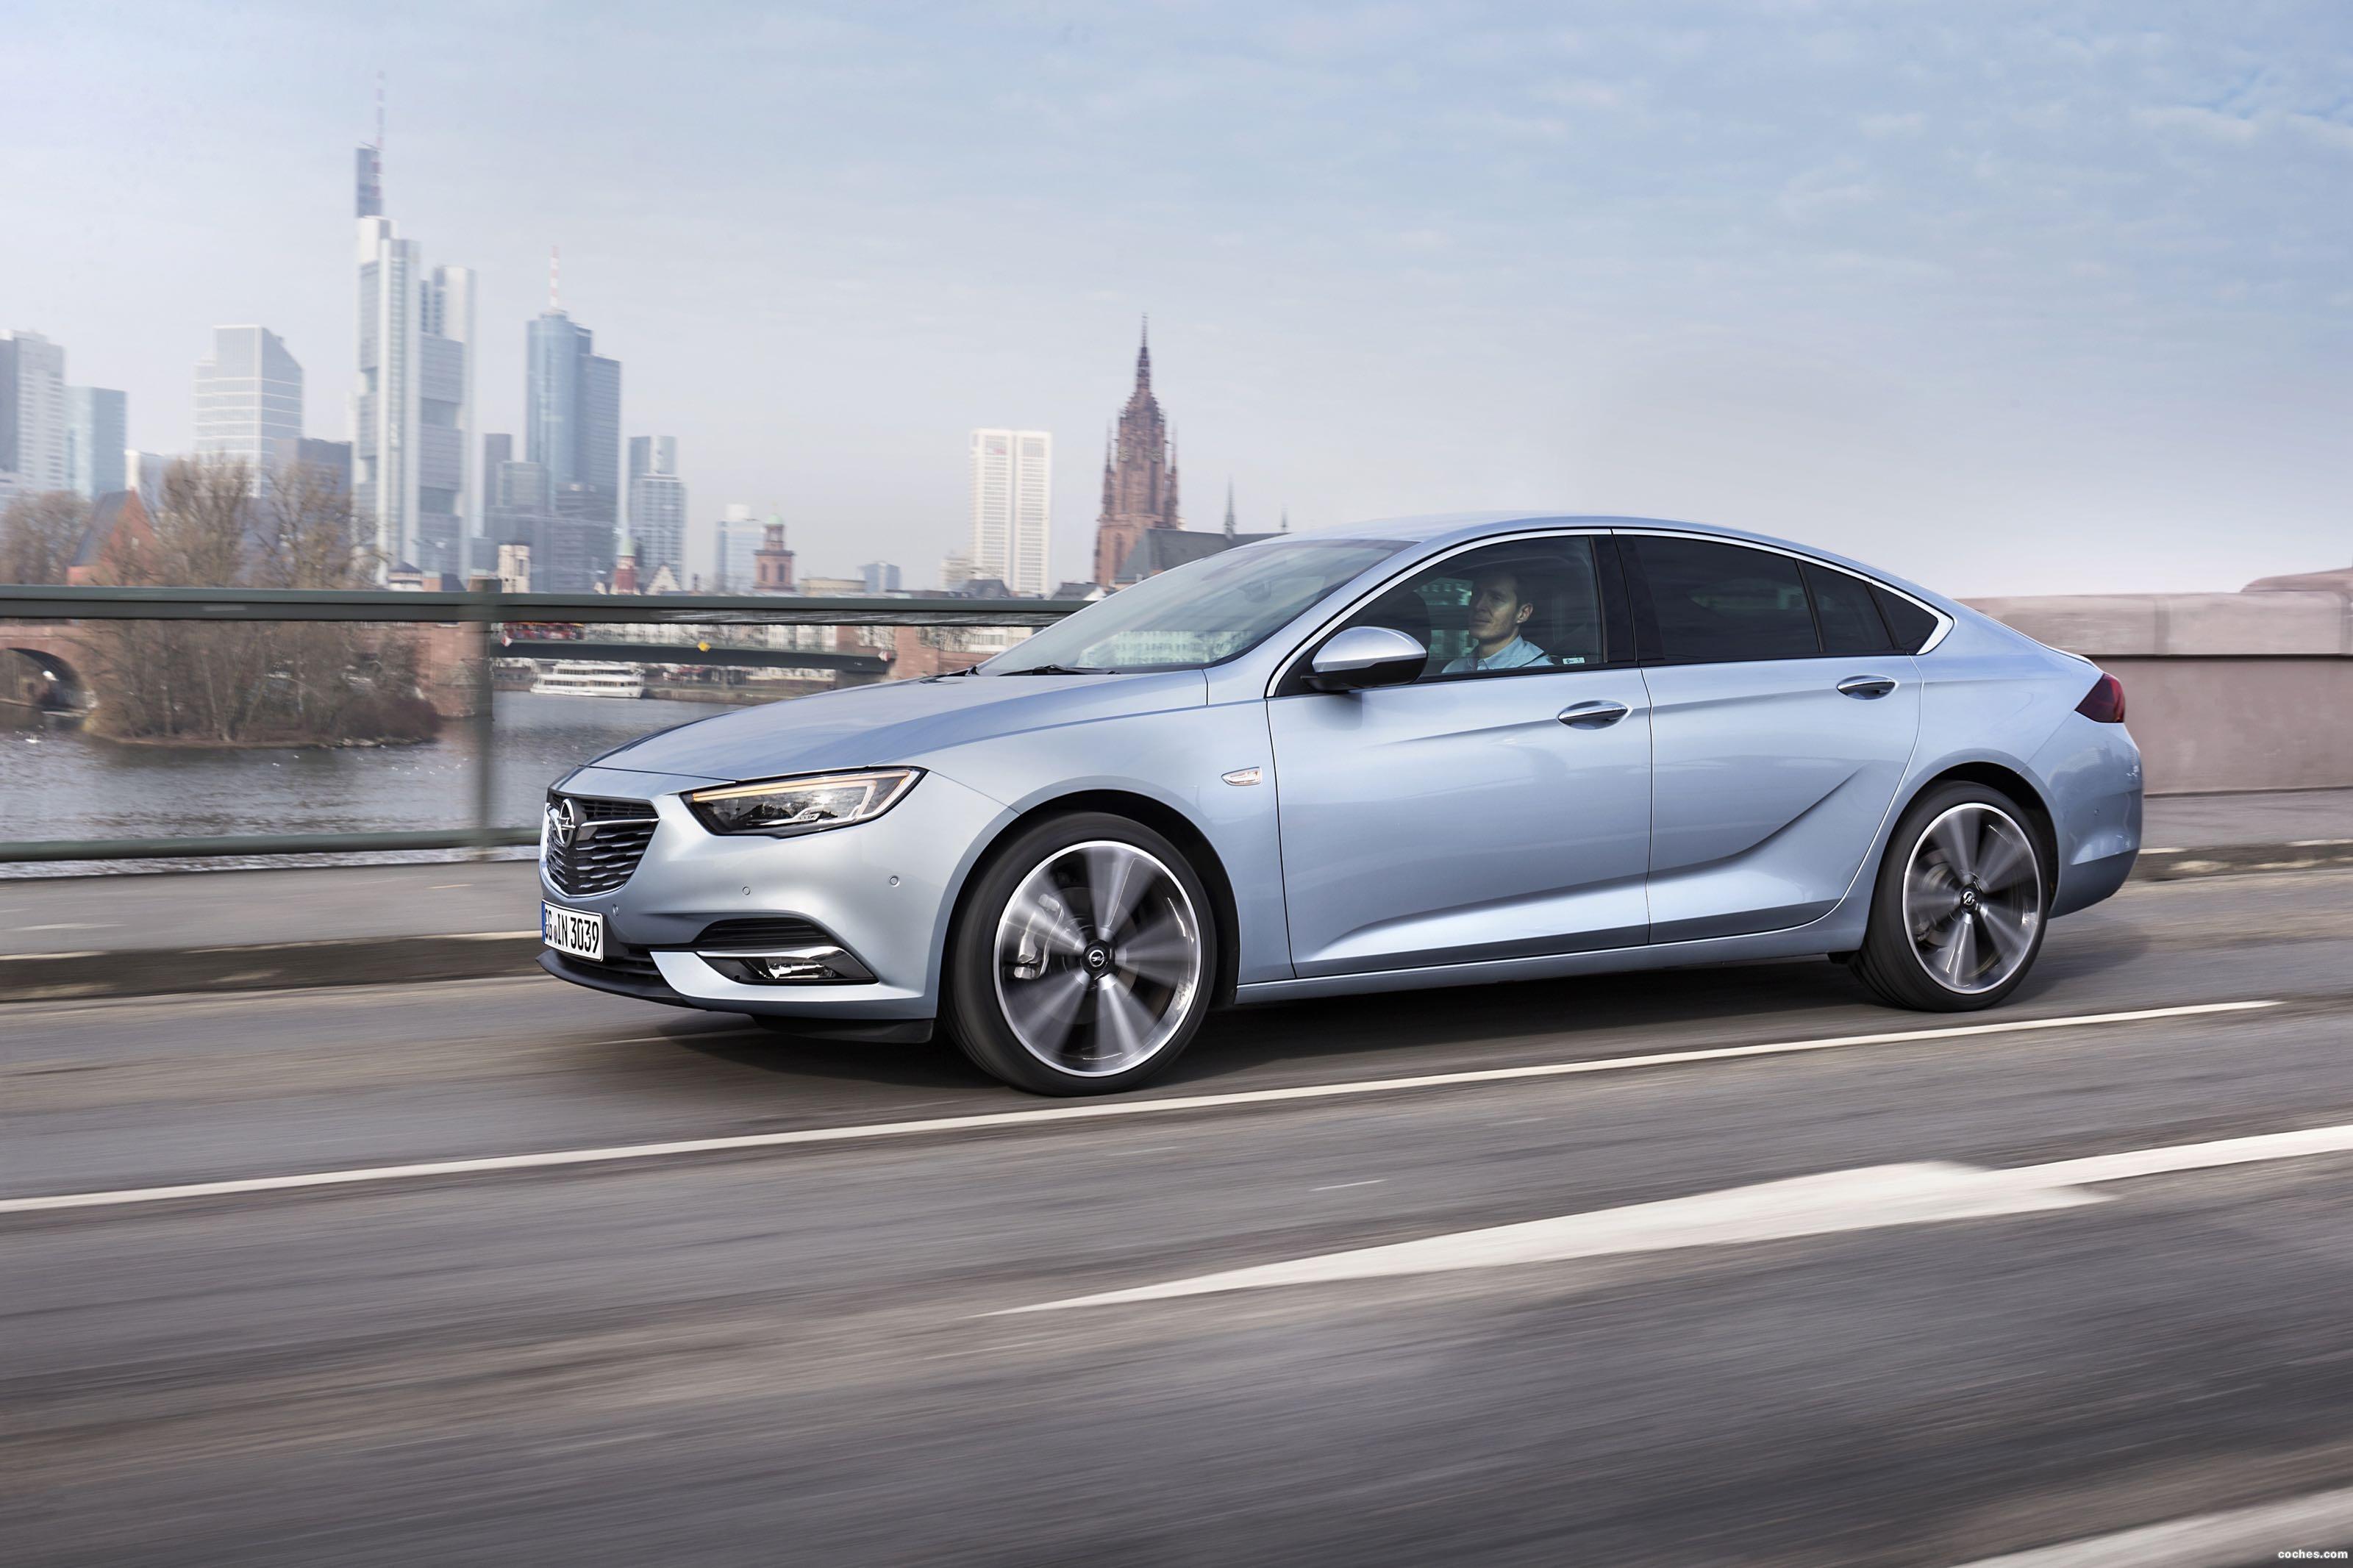 Foto 0 de Opel Insignia Grand Sport Turbo D 2017